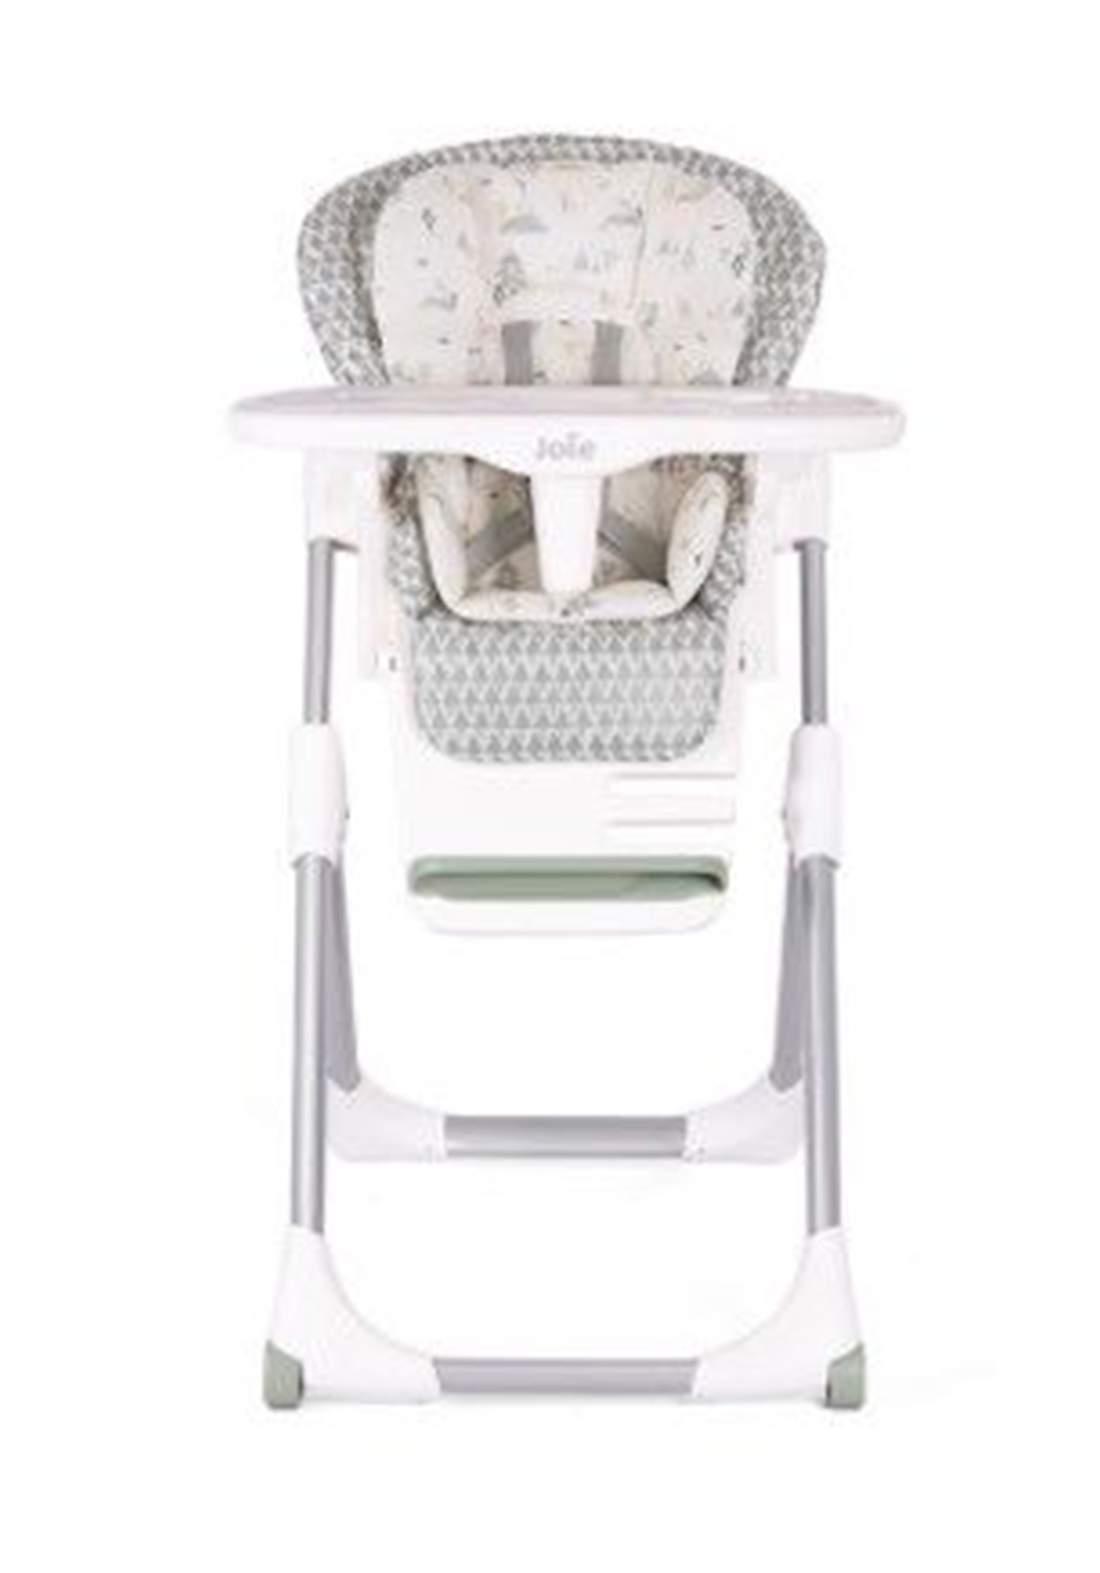 كرسي طعام للاطفال  Joie Baby H1013CAWLD000 Mimzy High Chair